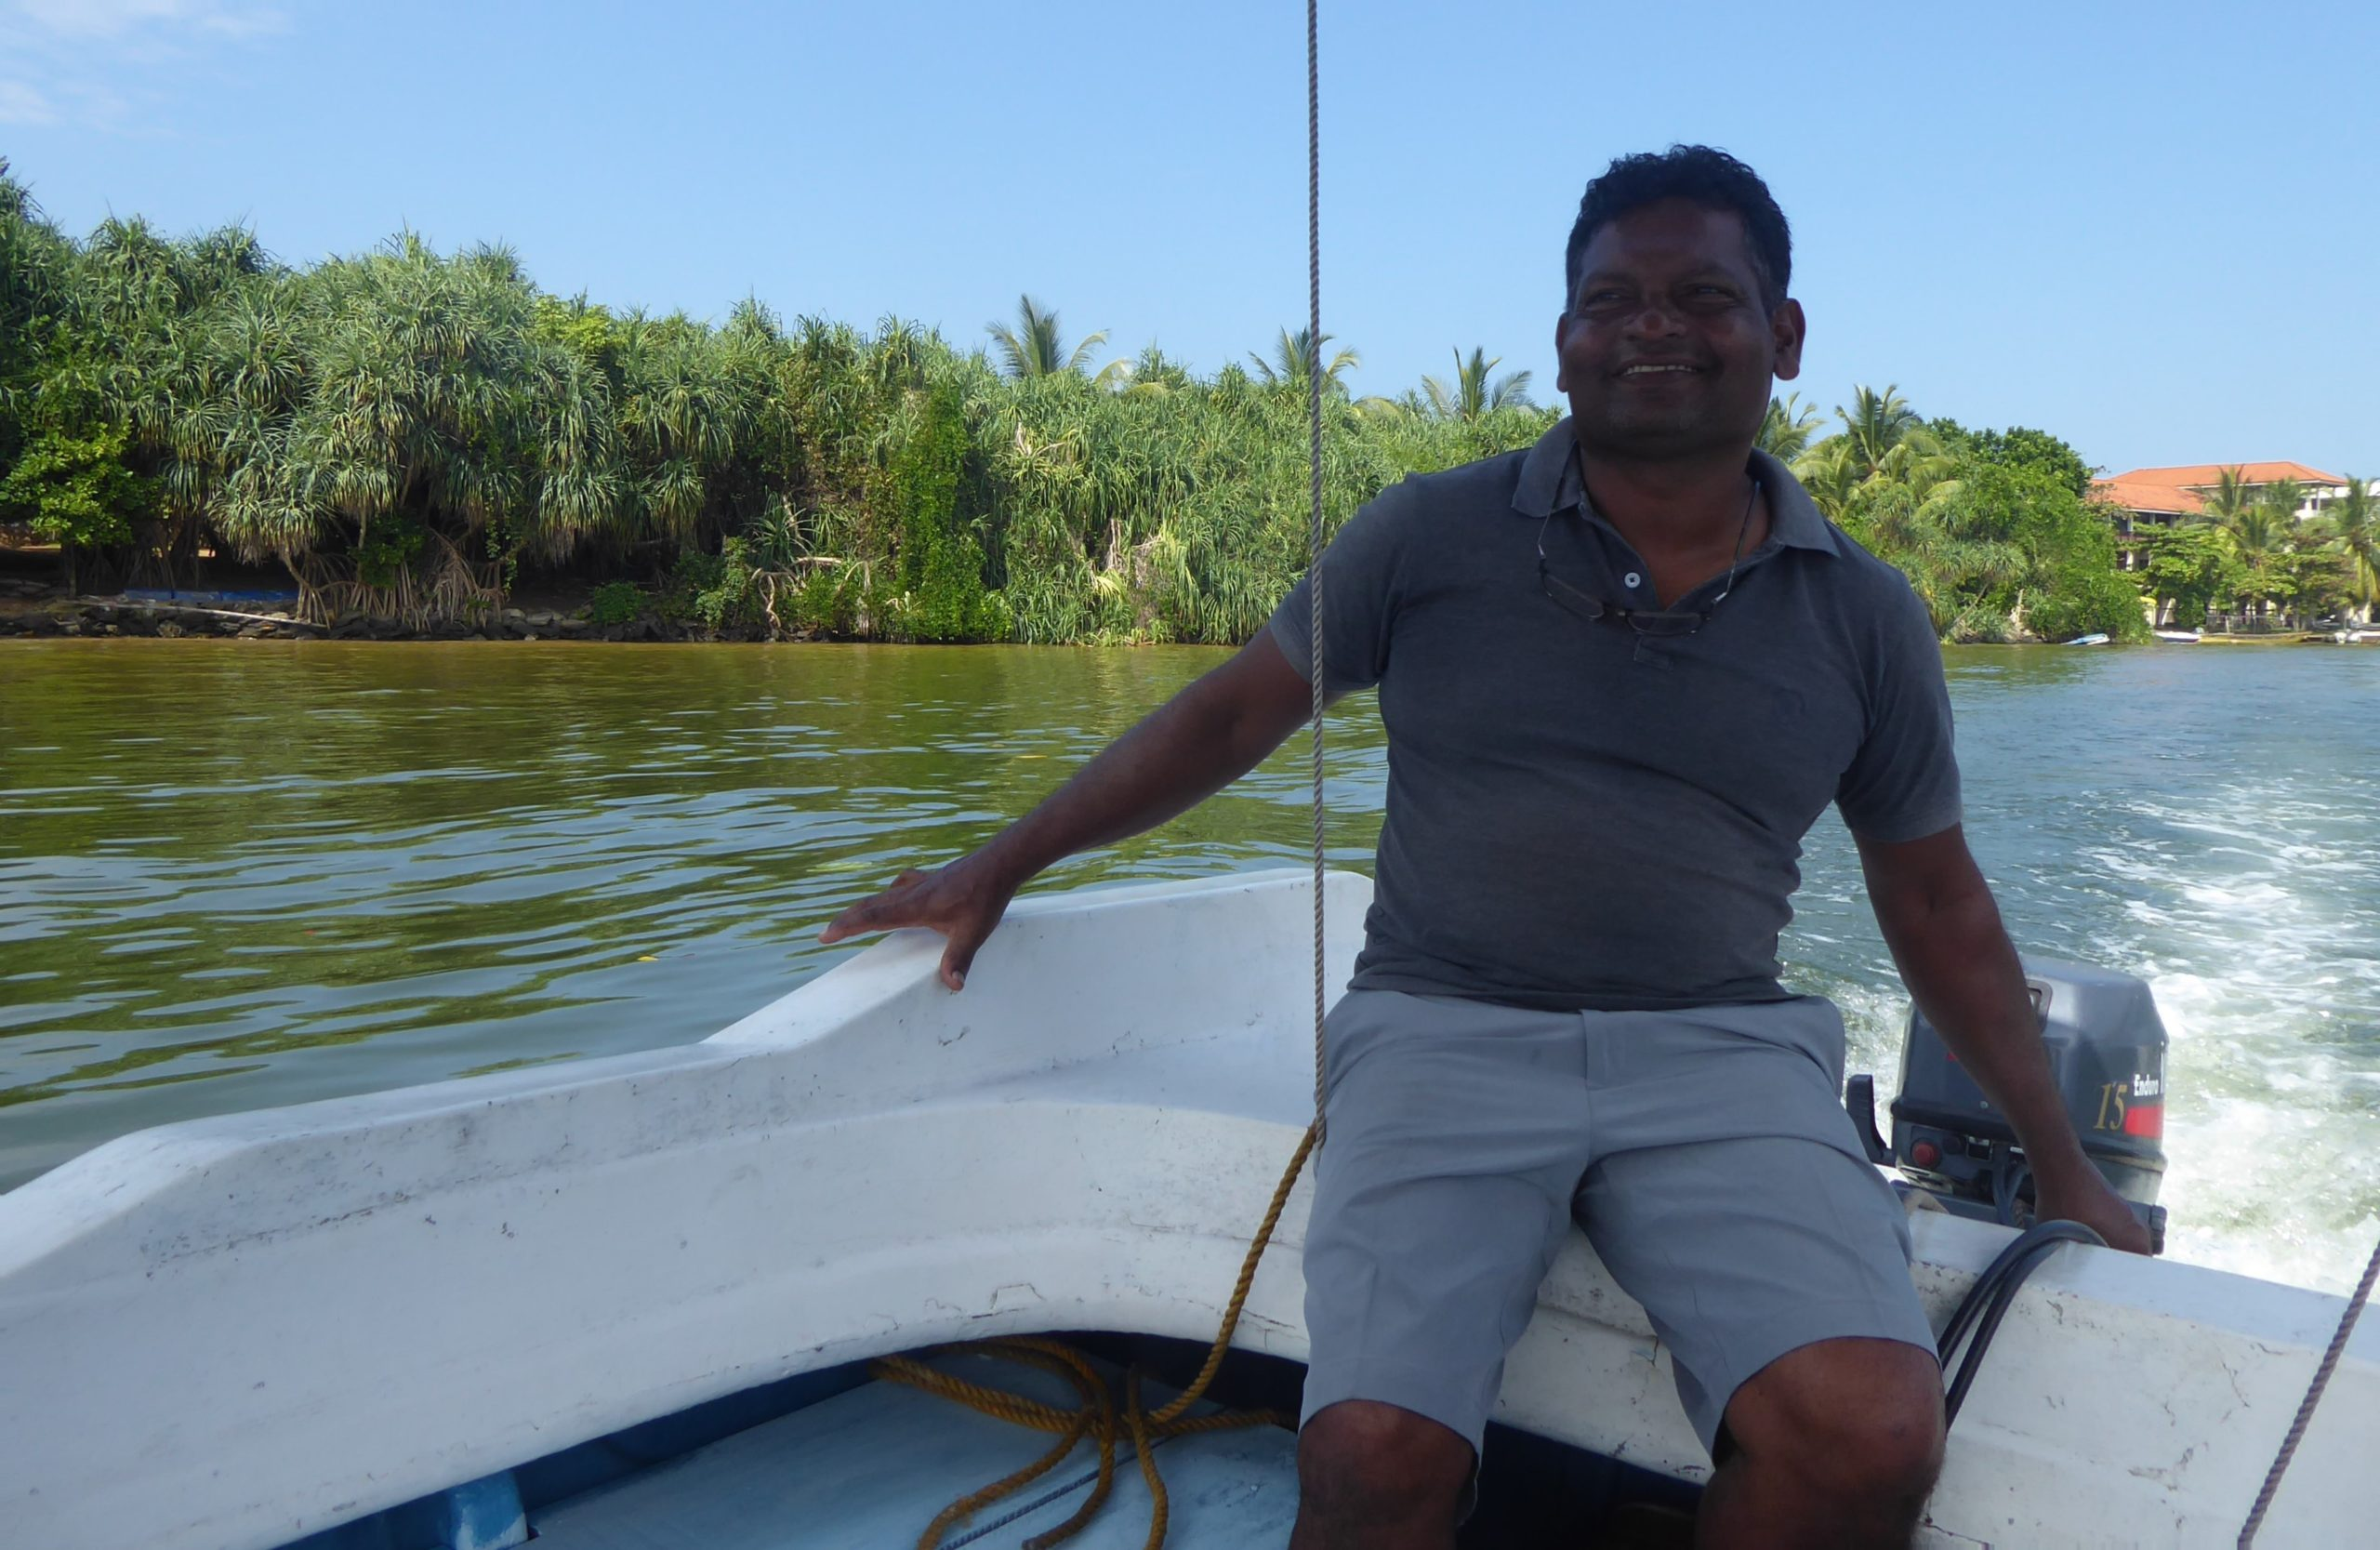 Nishan the boatman